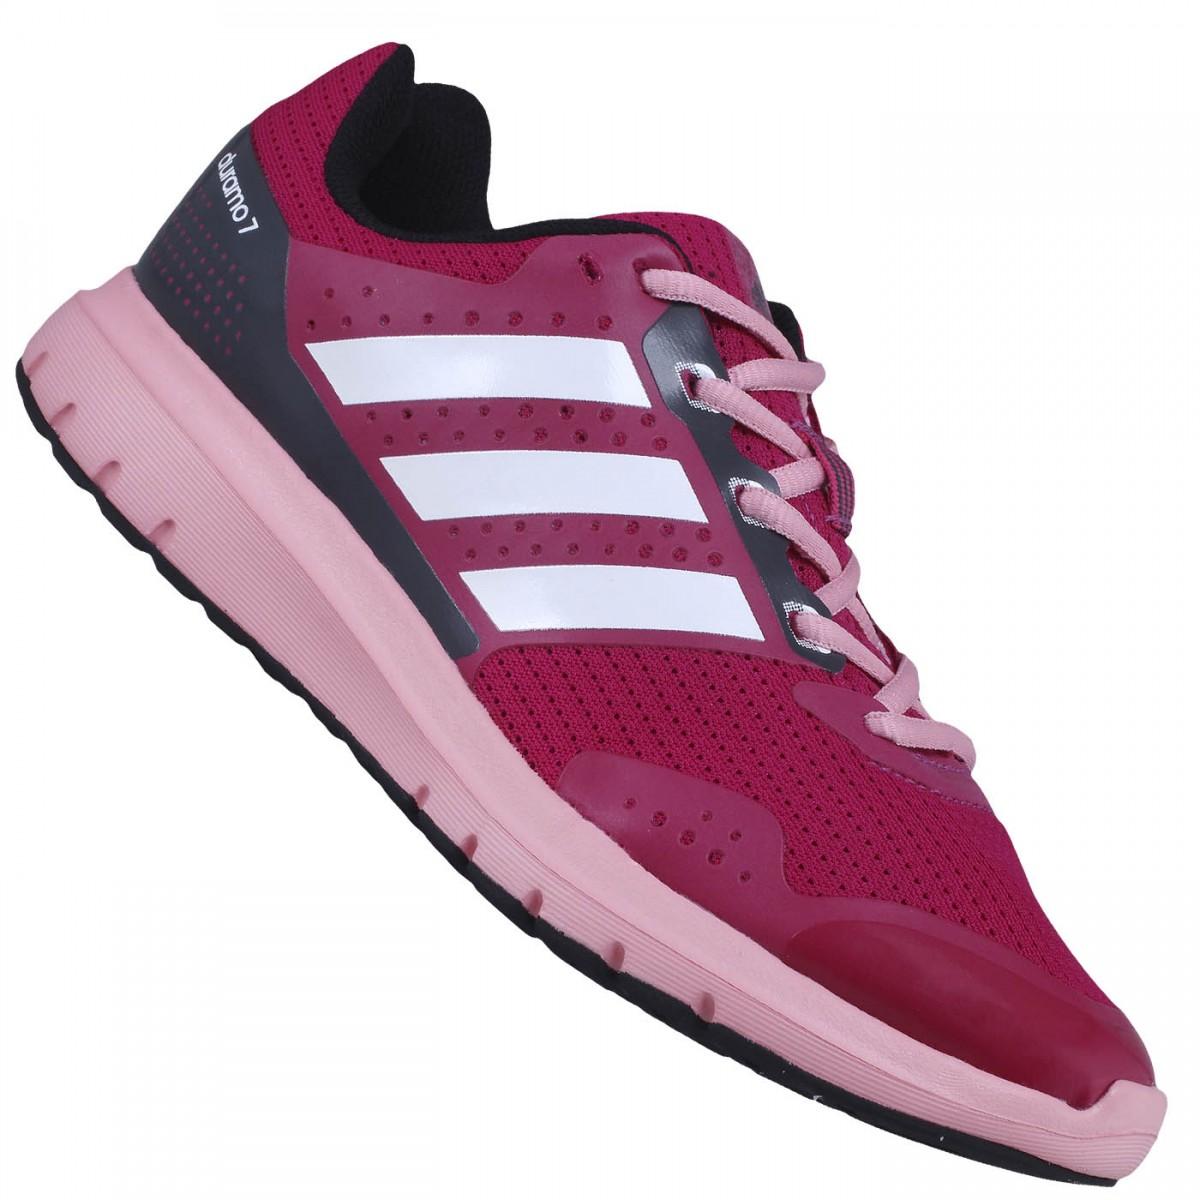 0e2287629c Tênis Adidas Duramo 7 - Feminino   Treino e Corrida